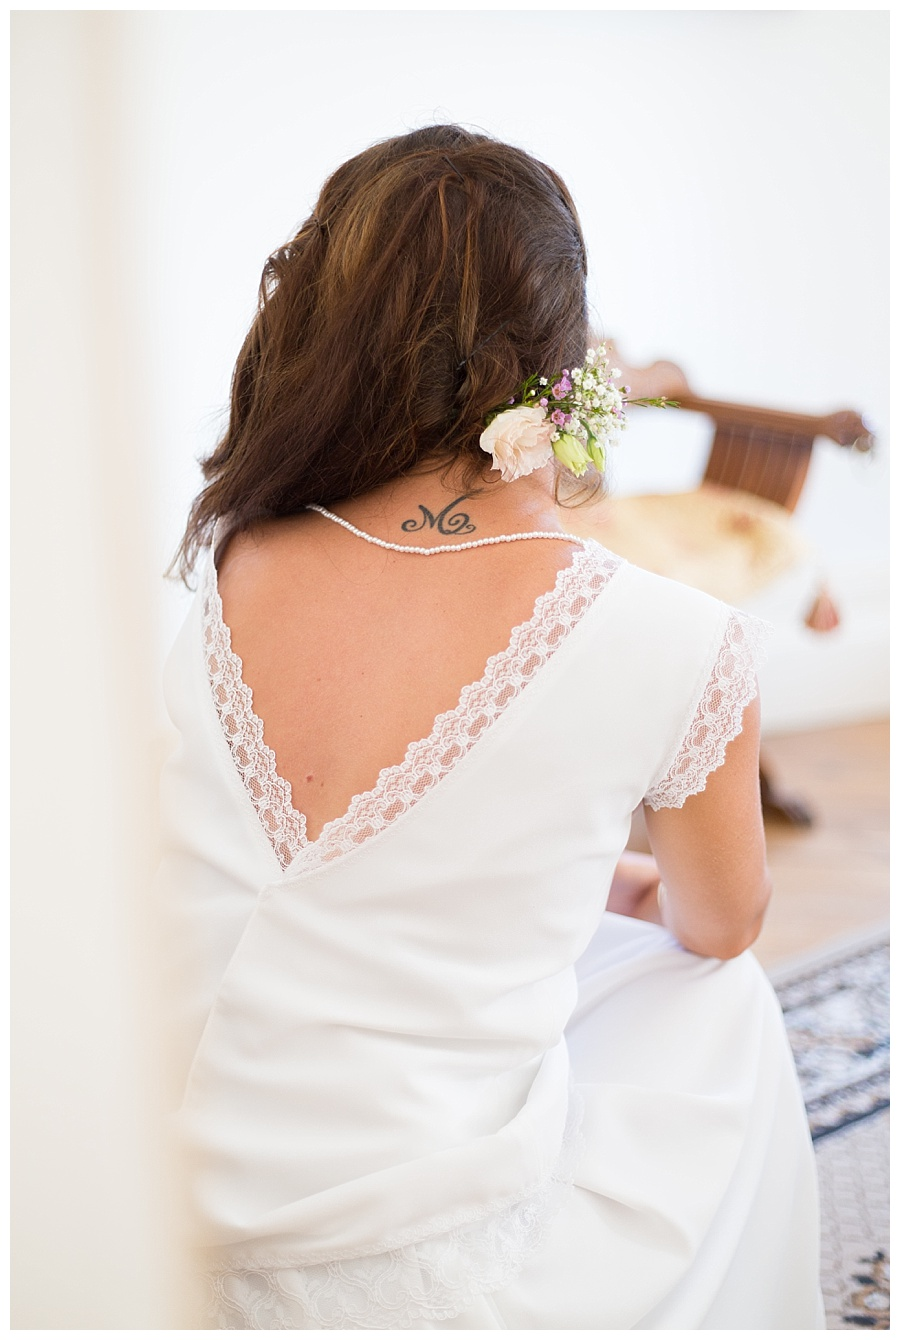 photographe-mariage-toulouse-anais-bertrand-mariage-tea-time-chateau-Lastours-robe-jolies-momans